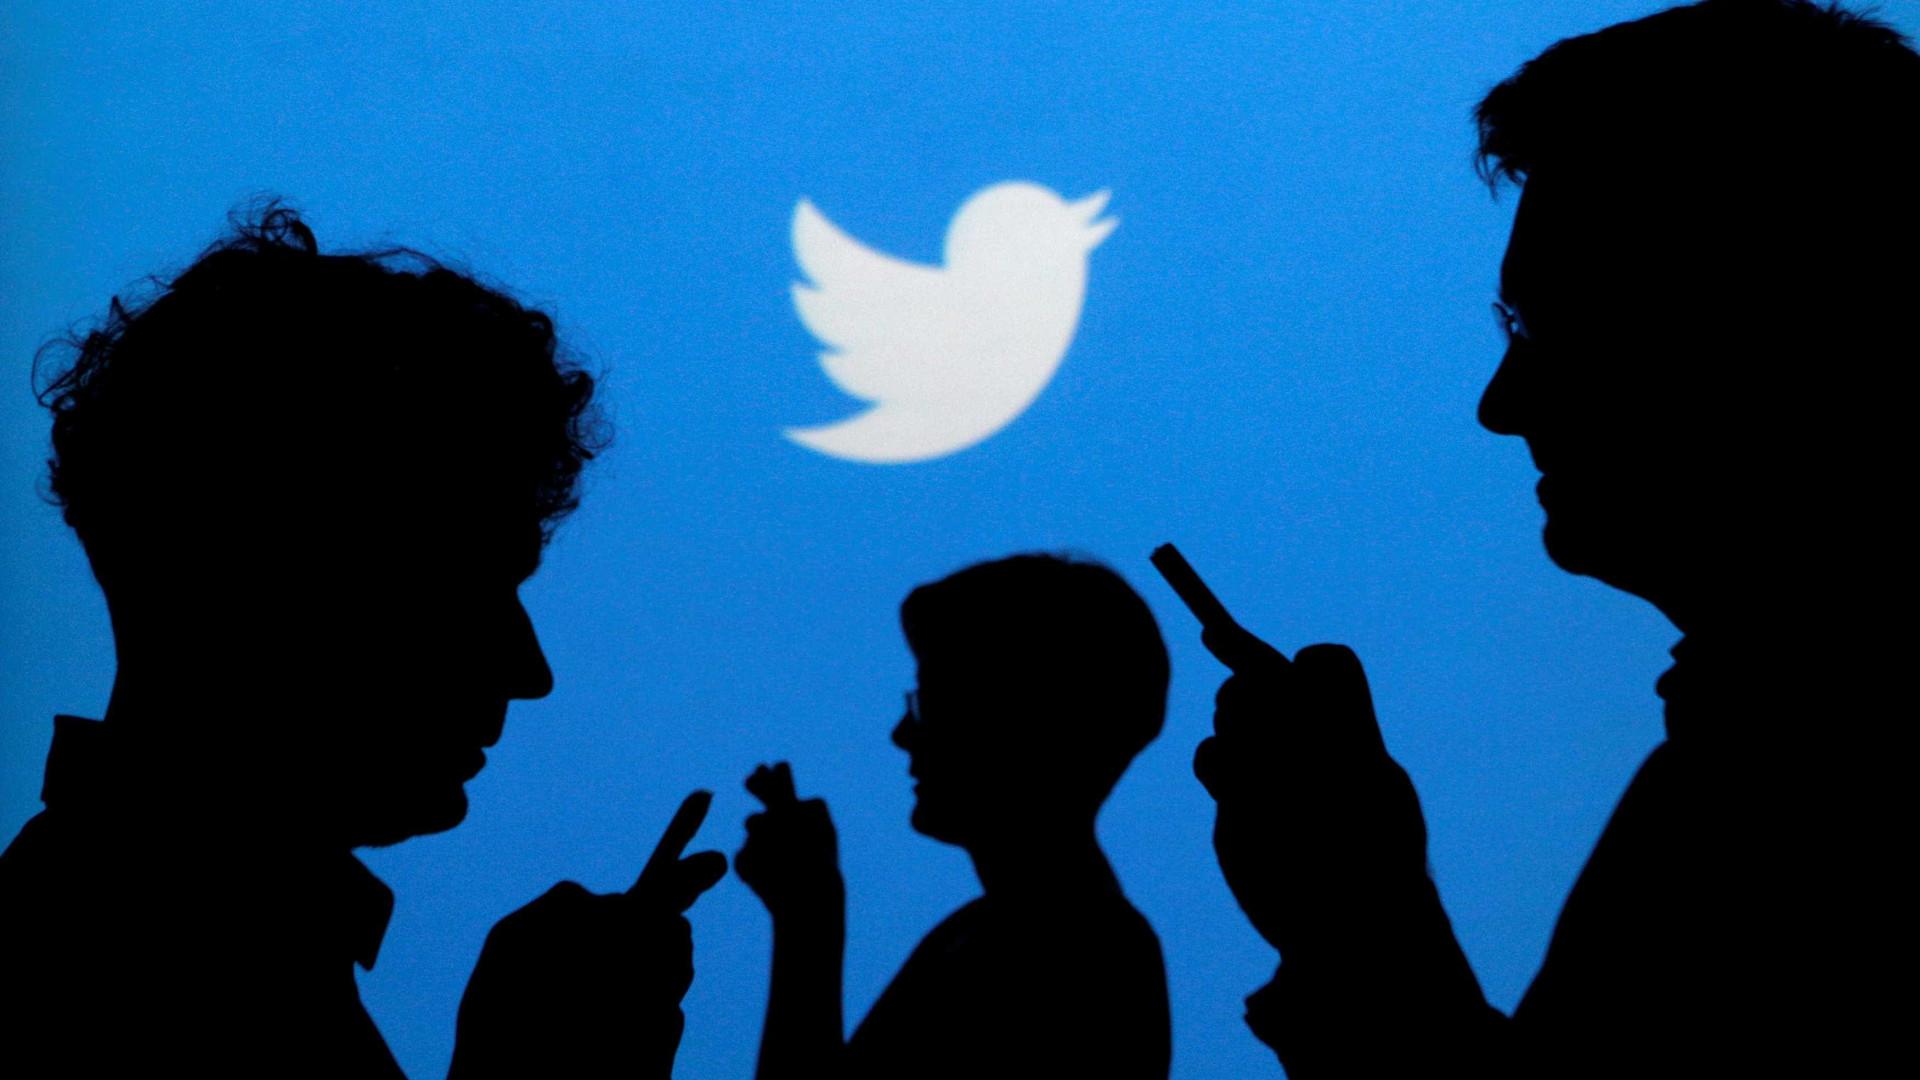 Twitter testa mensagens com até 280 caracteres